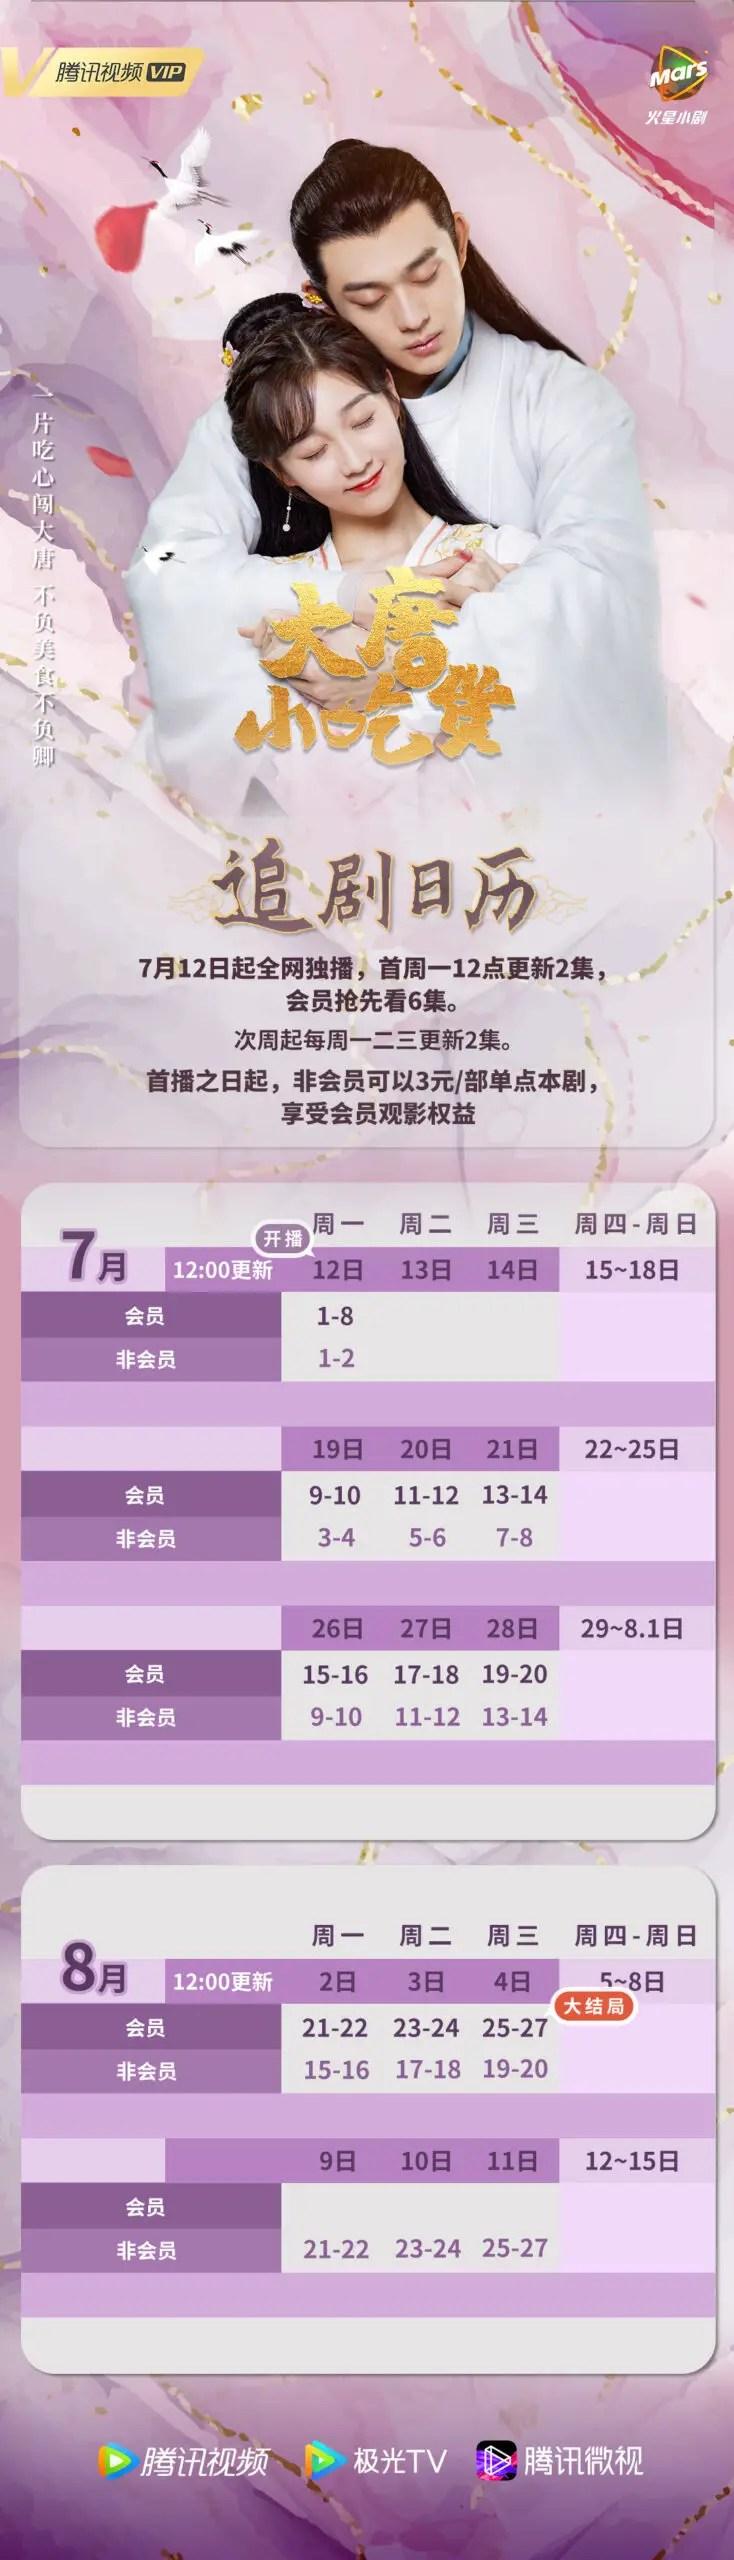 Gourmet in Tang Dynasty Drama Airing Calendar